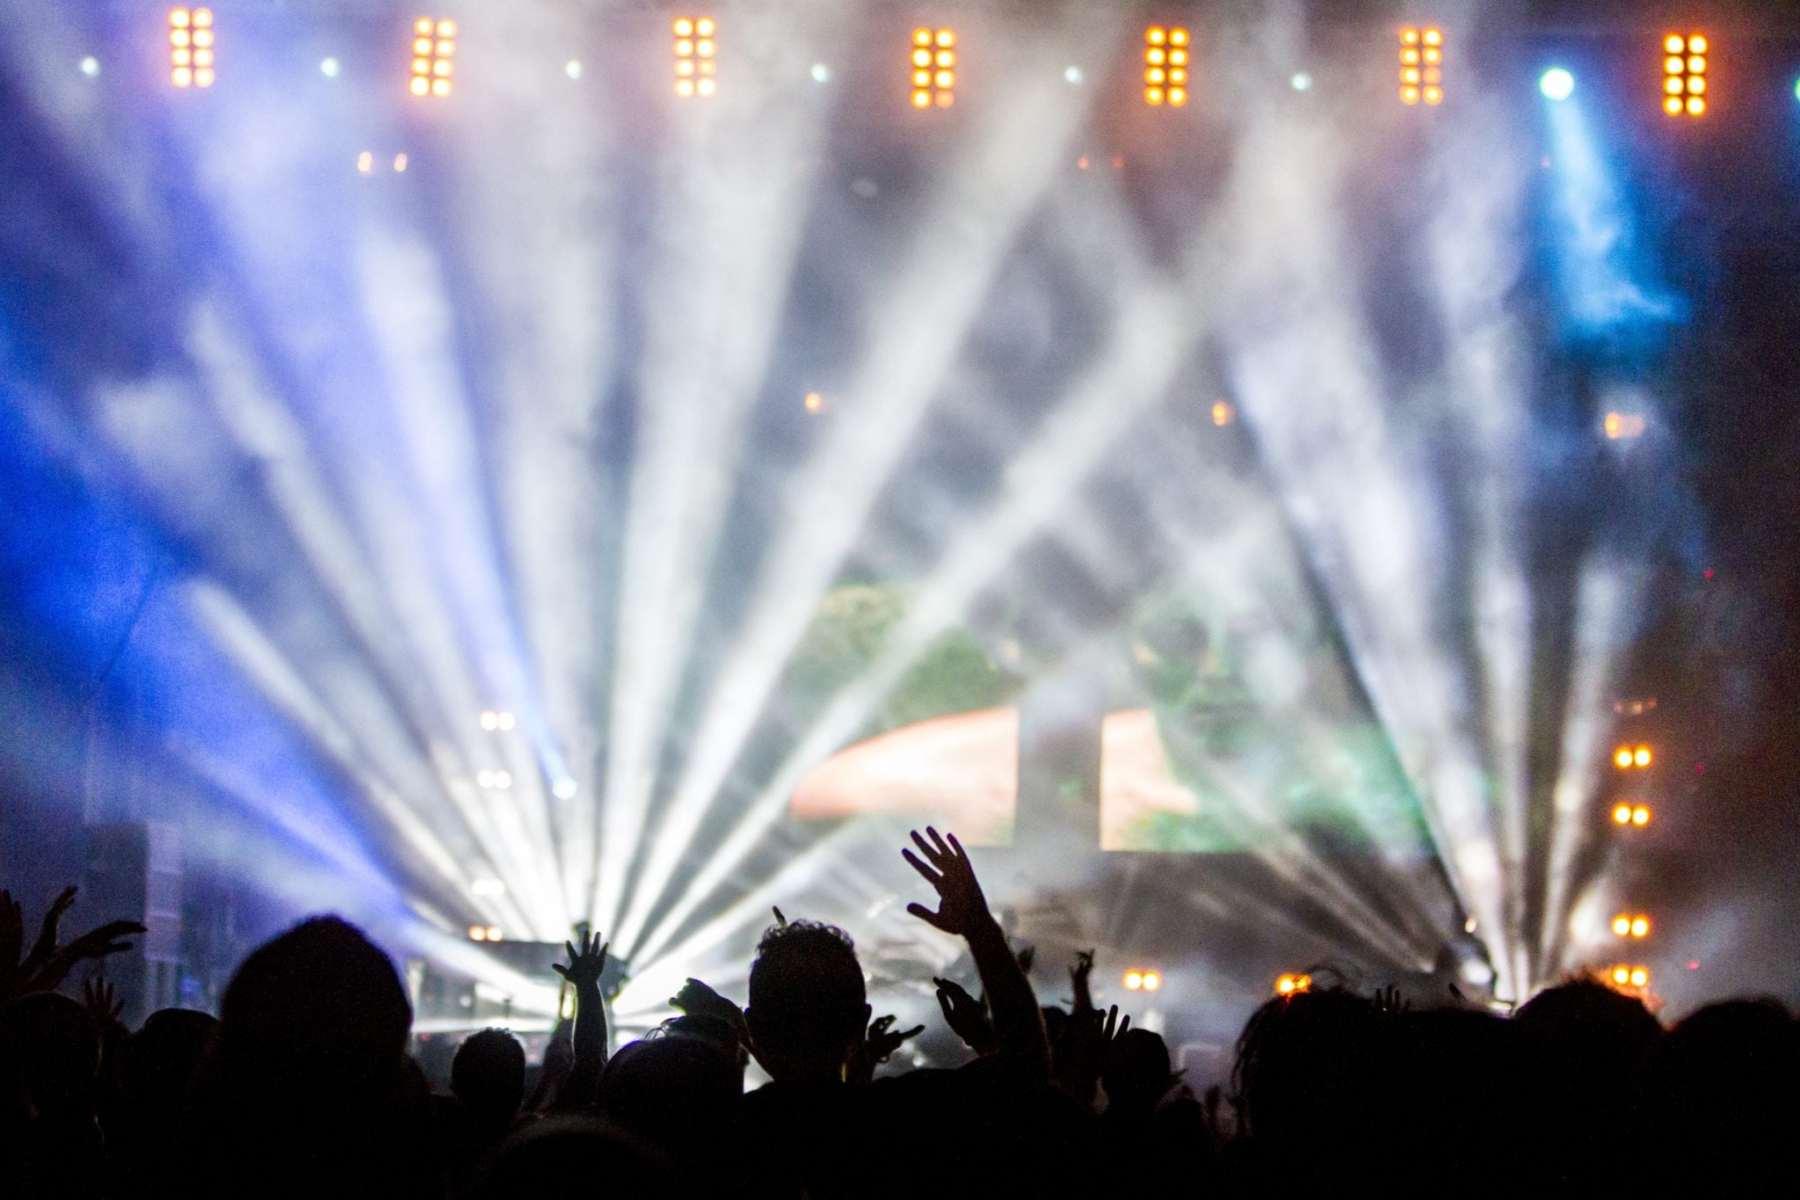 club festival montreal st-laurent boulevard